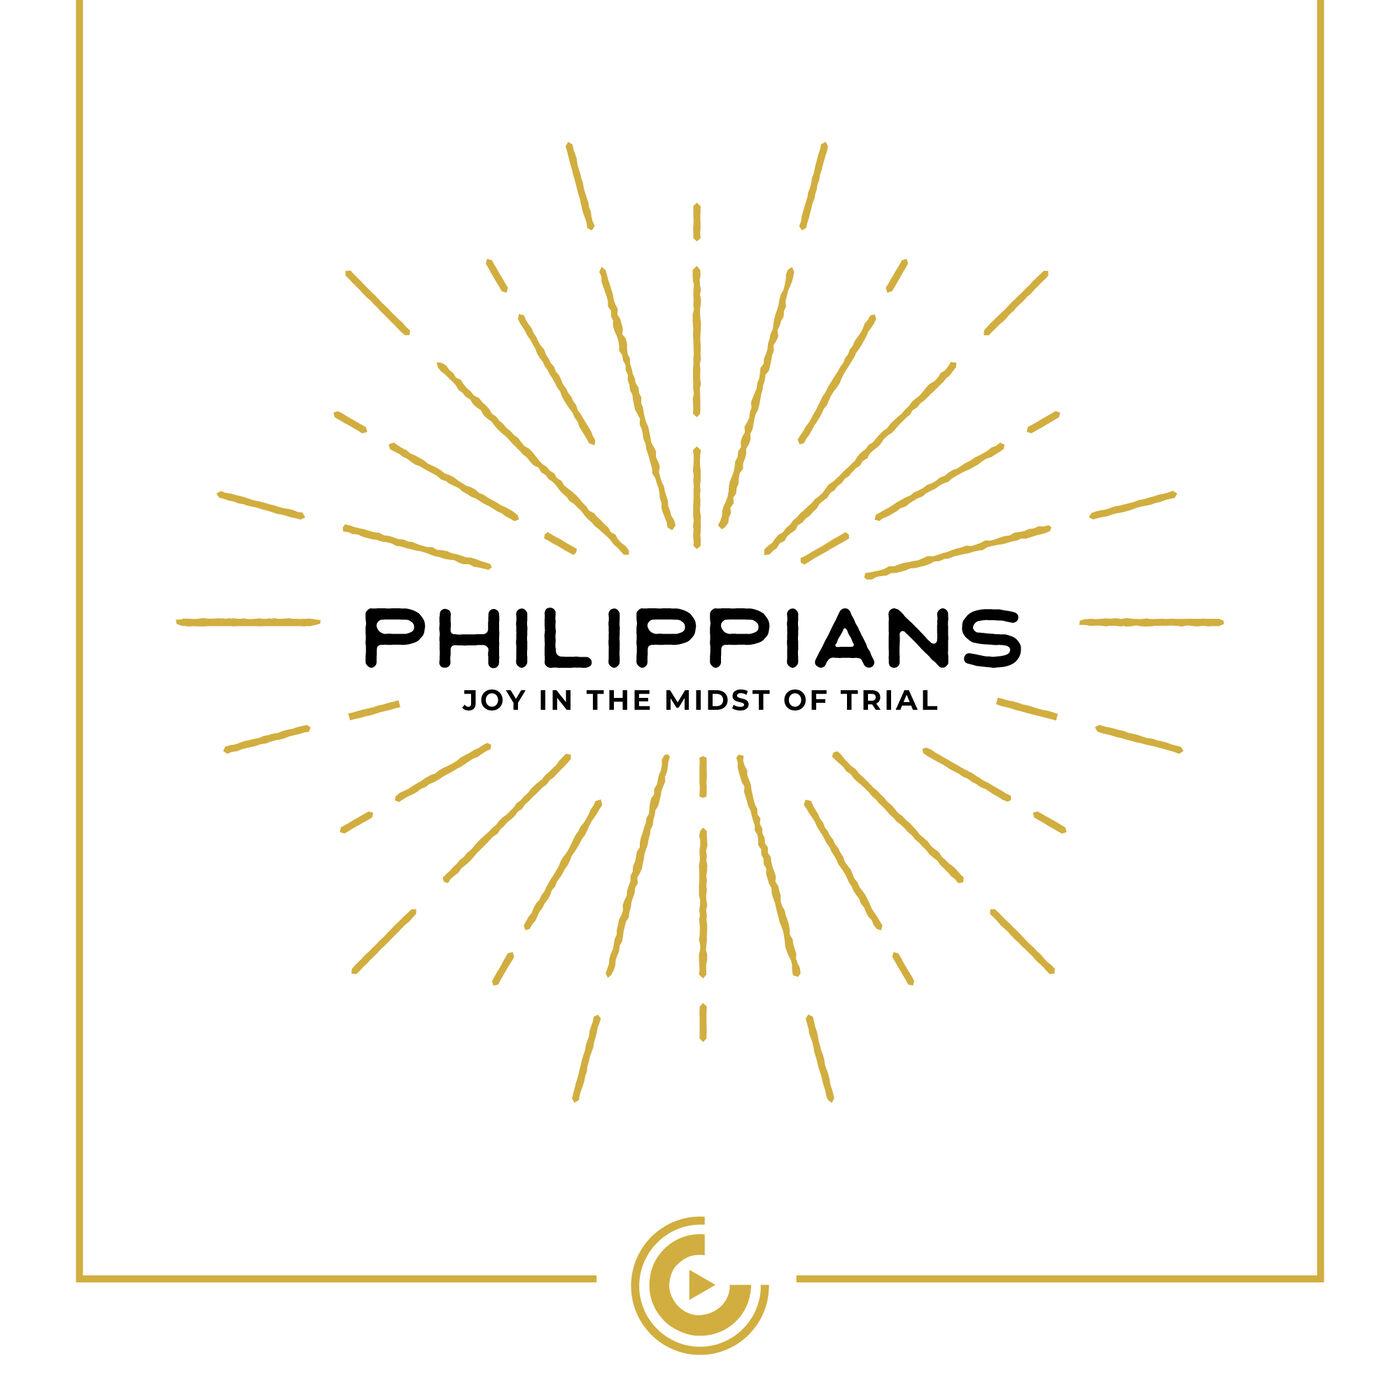 Christ Church Media Bible Study: Philippians 1:1-5